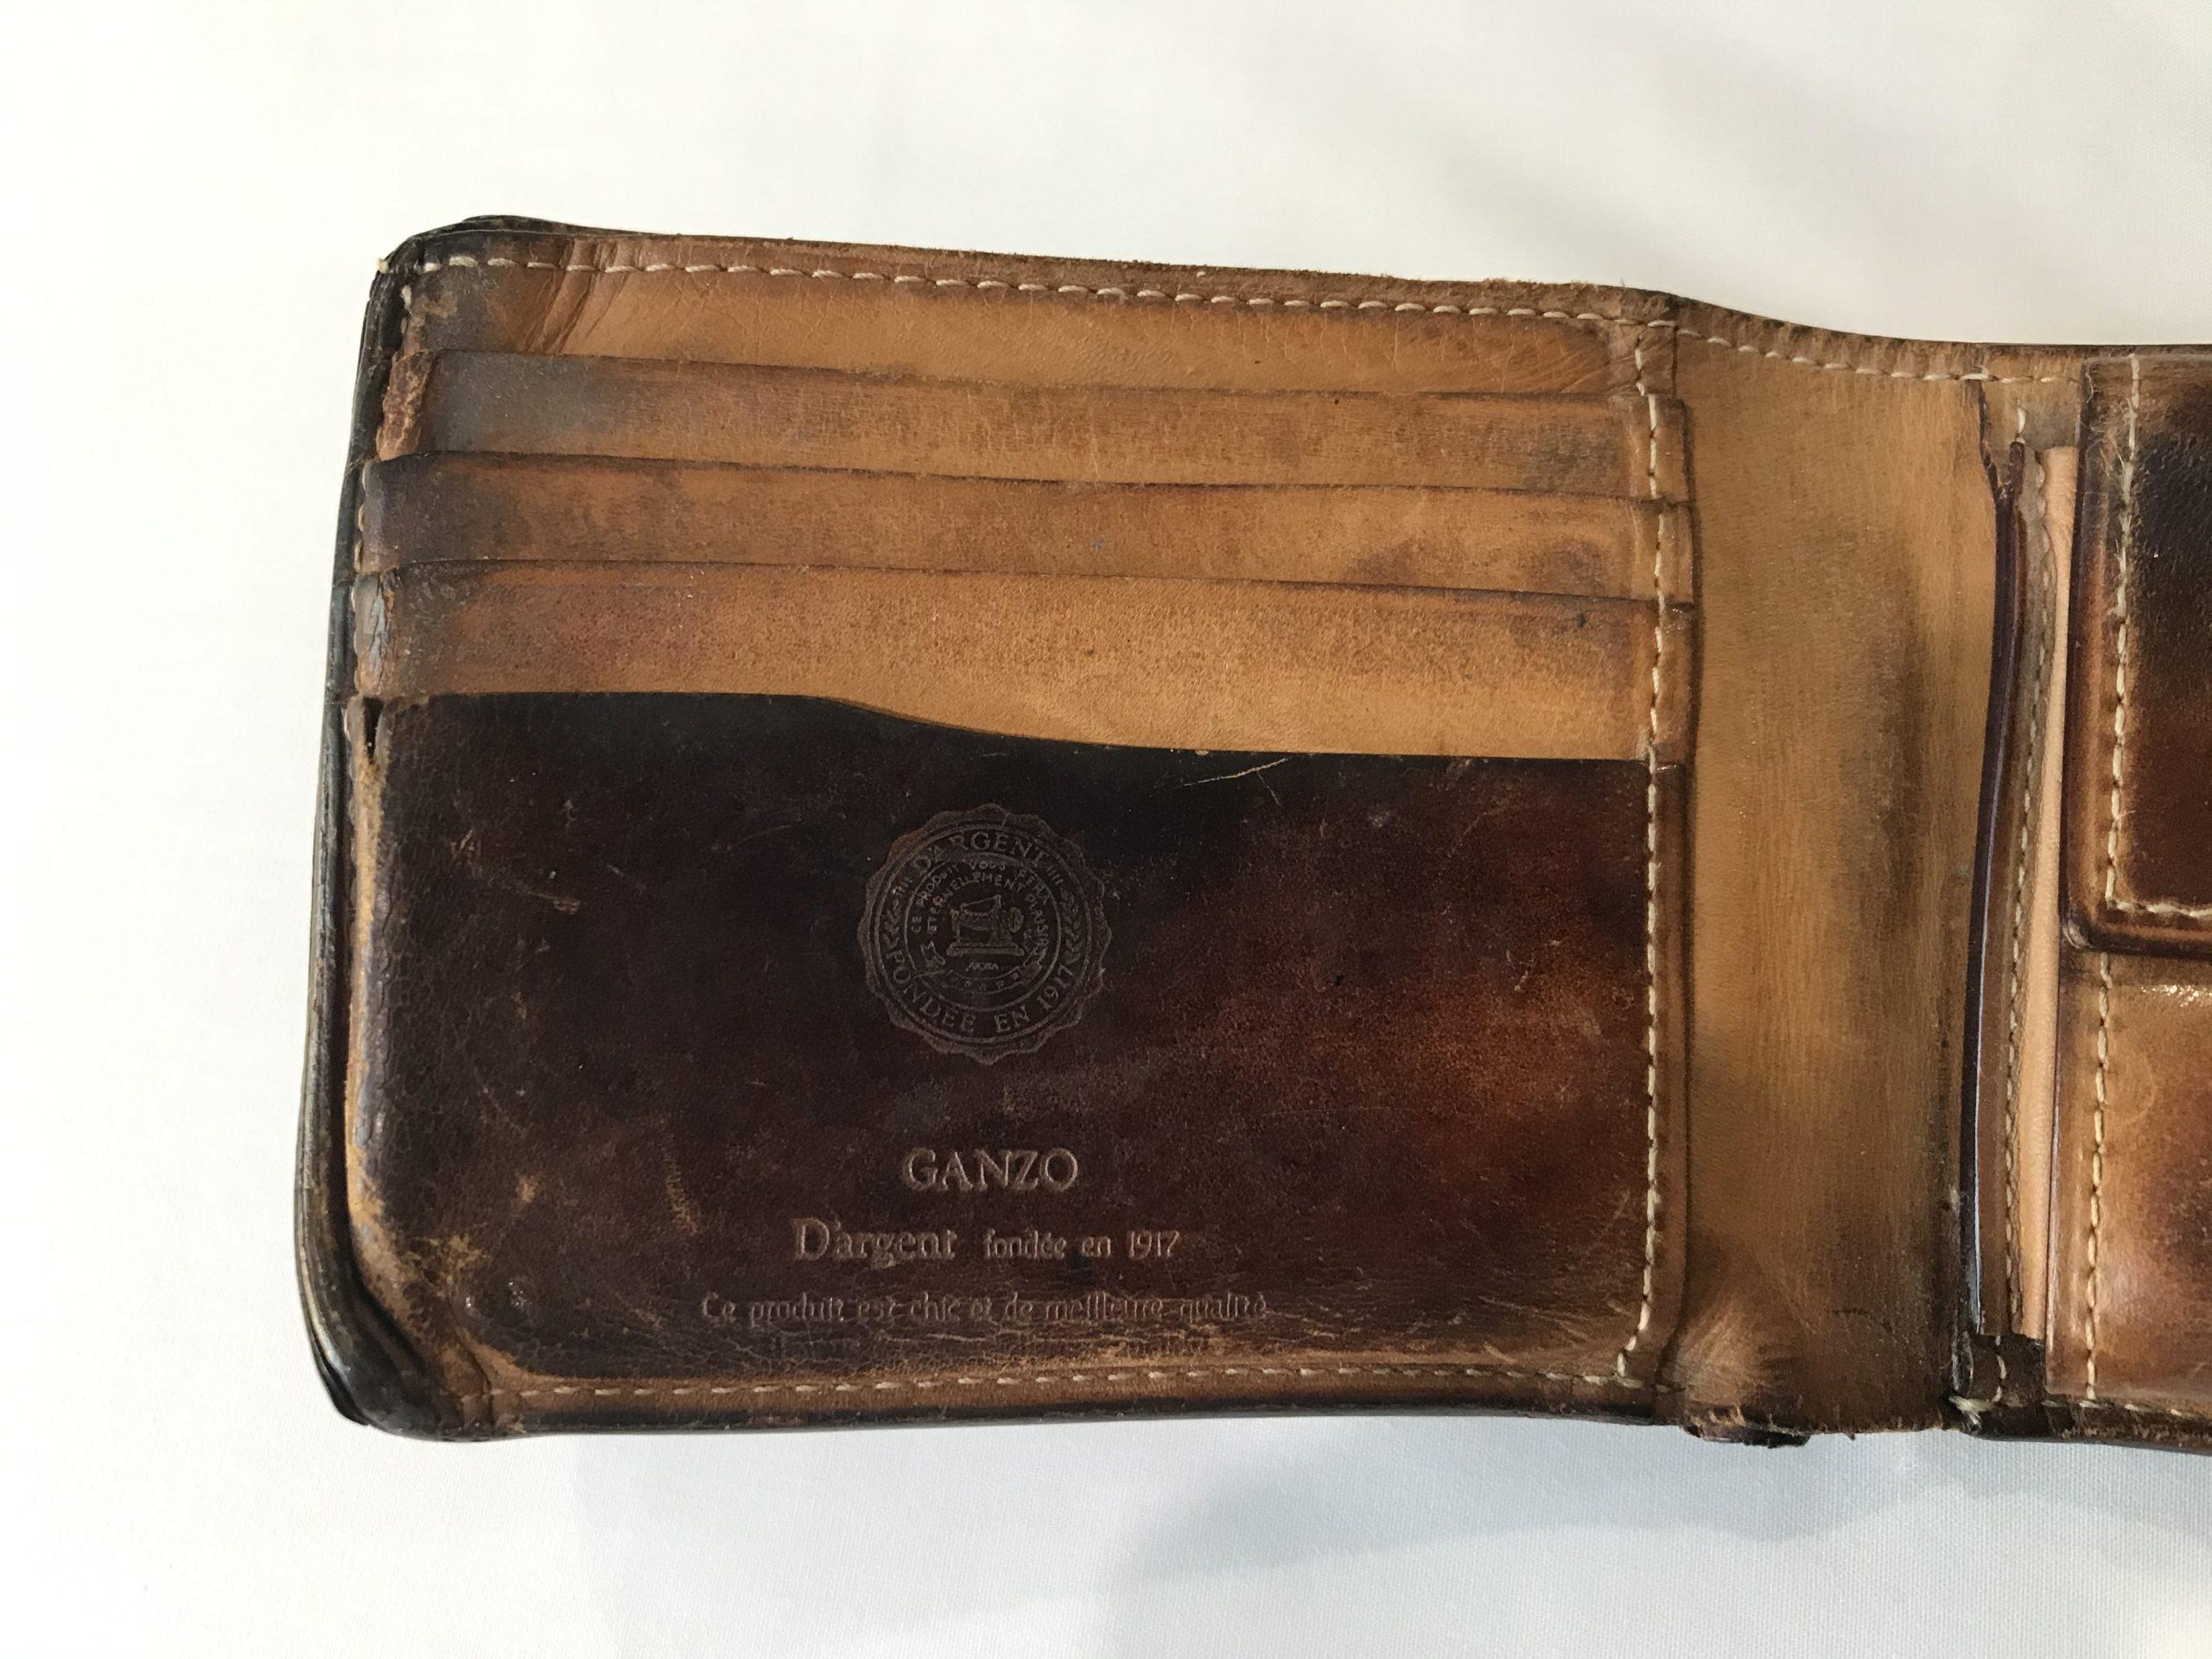 GANZO財布 エイジング 18年